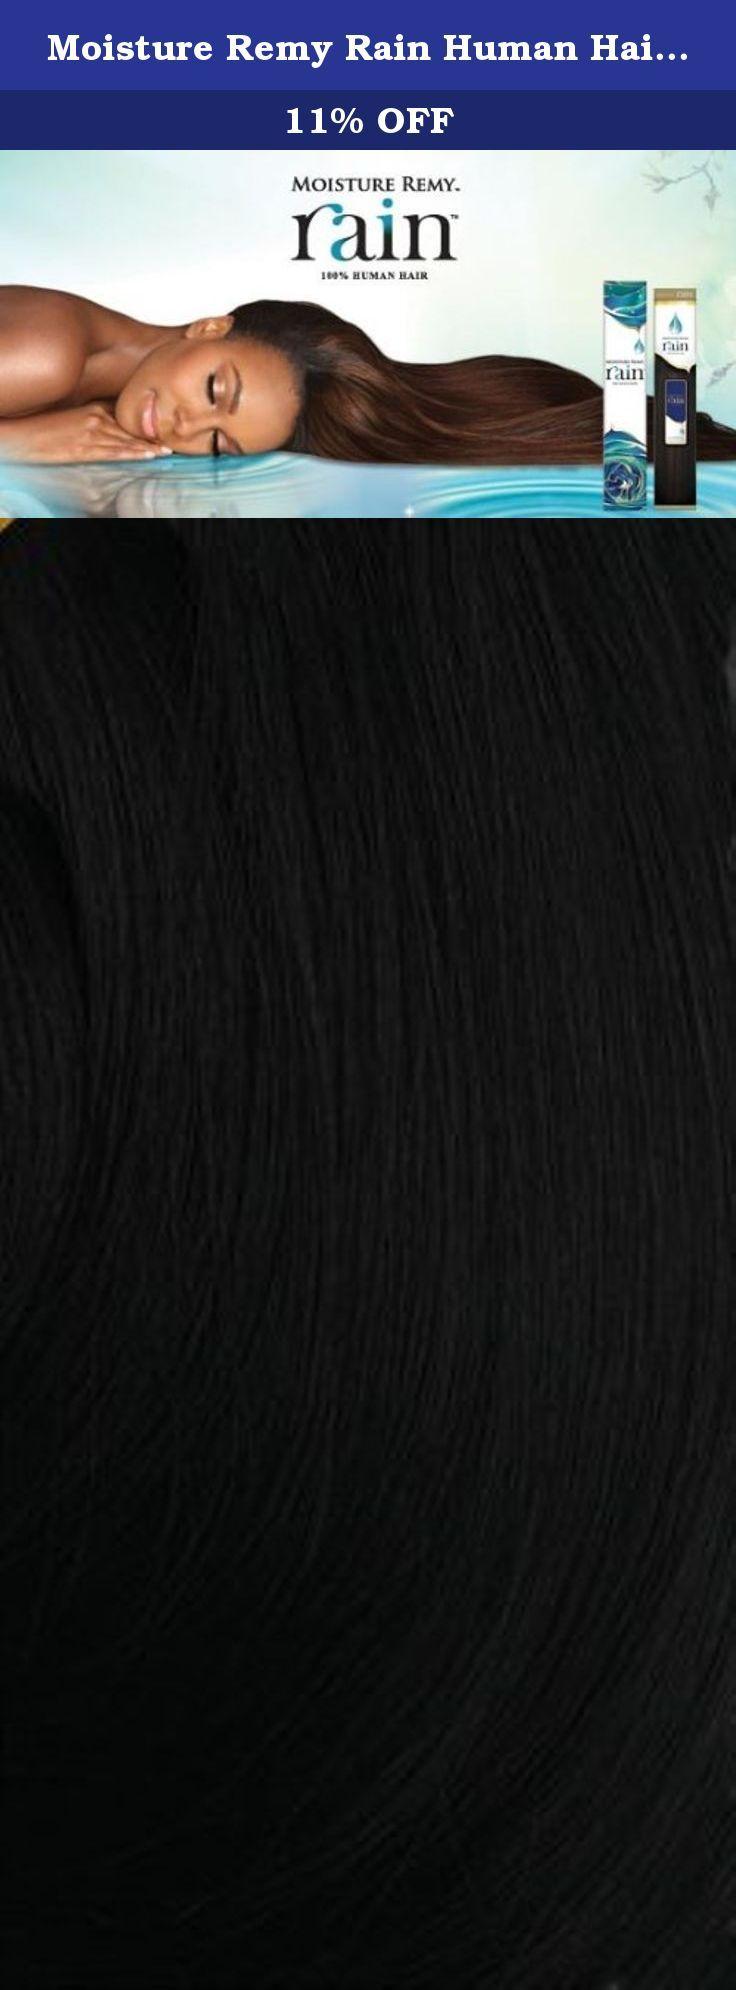 Moisture remy rain human hair weave yaky 16 inch 1 jet black moisture remy rain human hair weave yaky 16 inch 1 jet black pmusecretfo Image collections